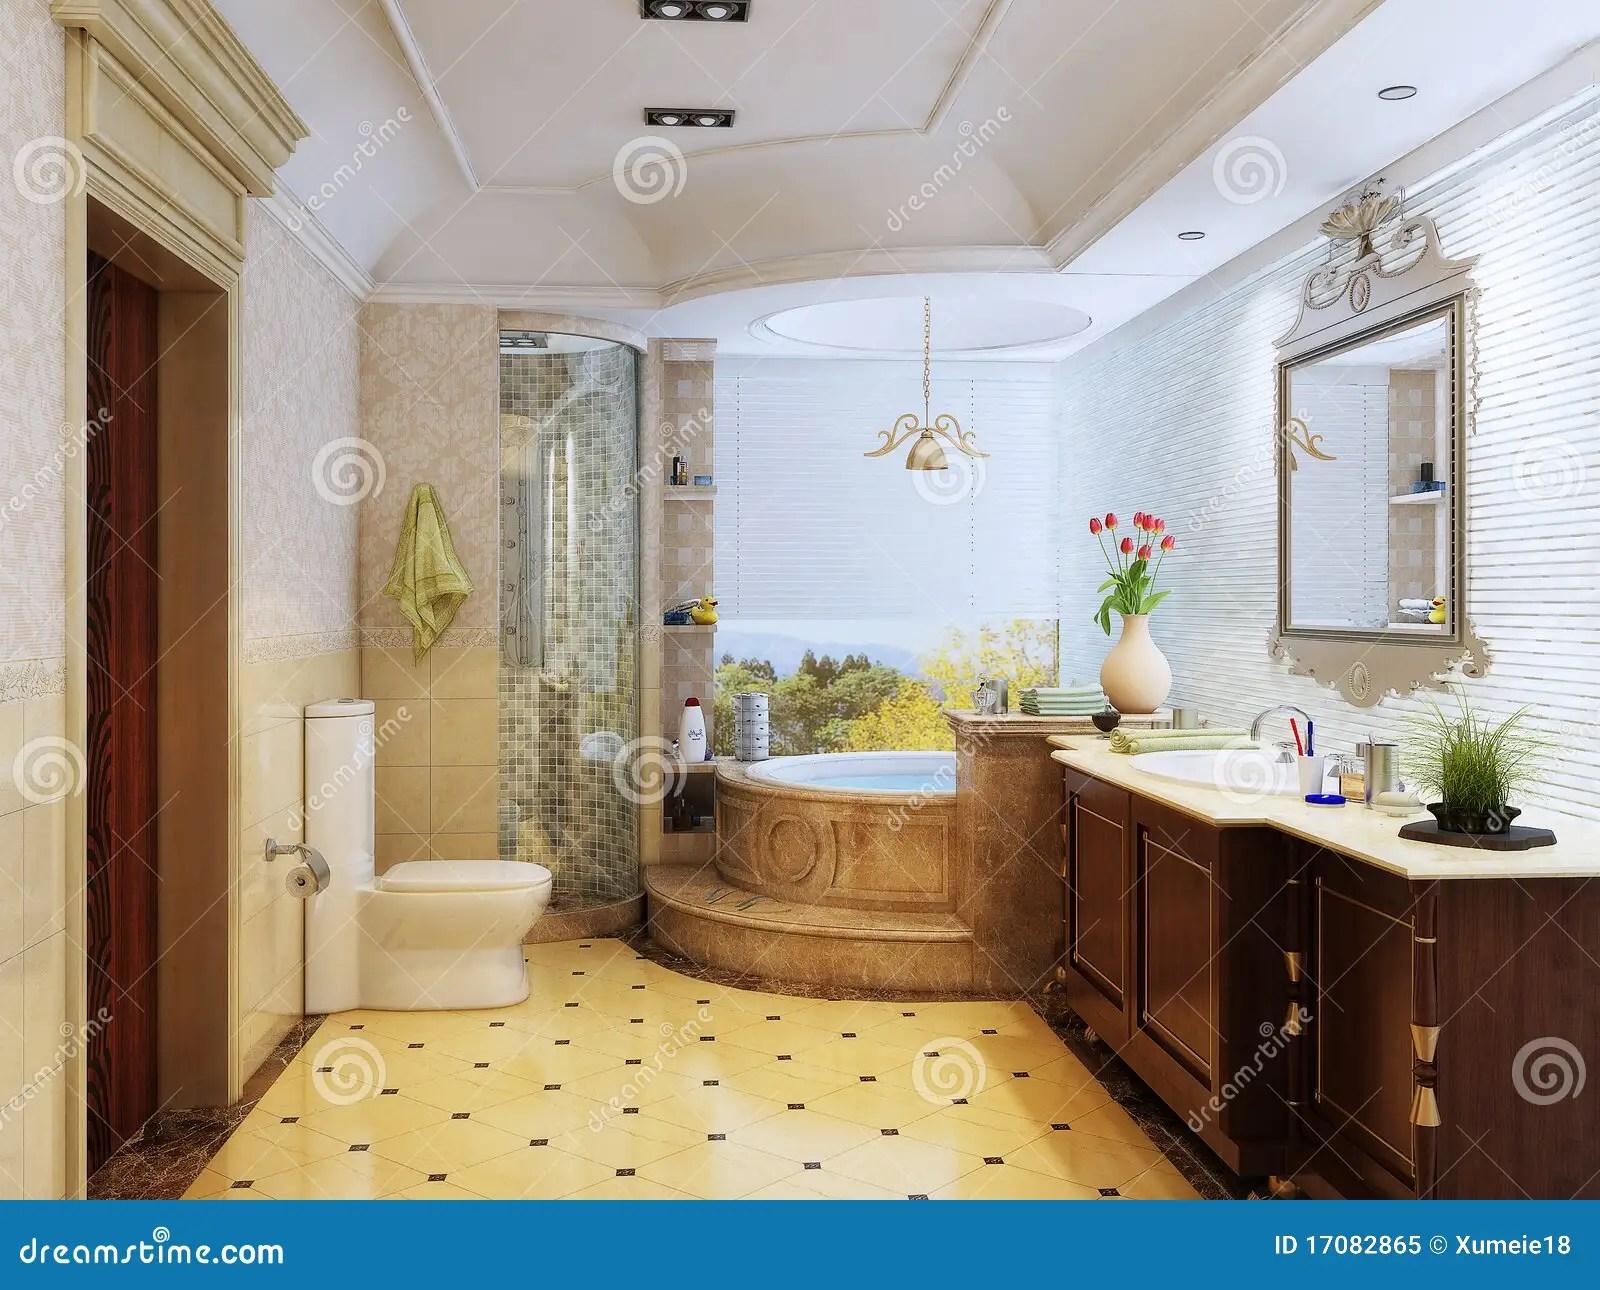 3d Fußboden Folie ~ D fußboden badezimmer preise draufsicht des grundrisses des